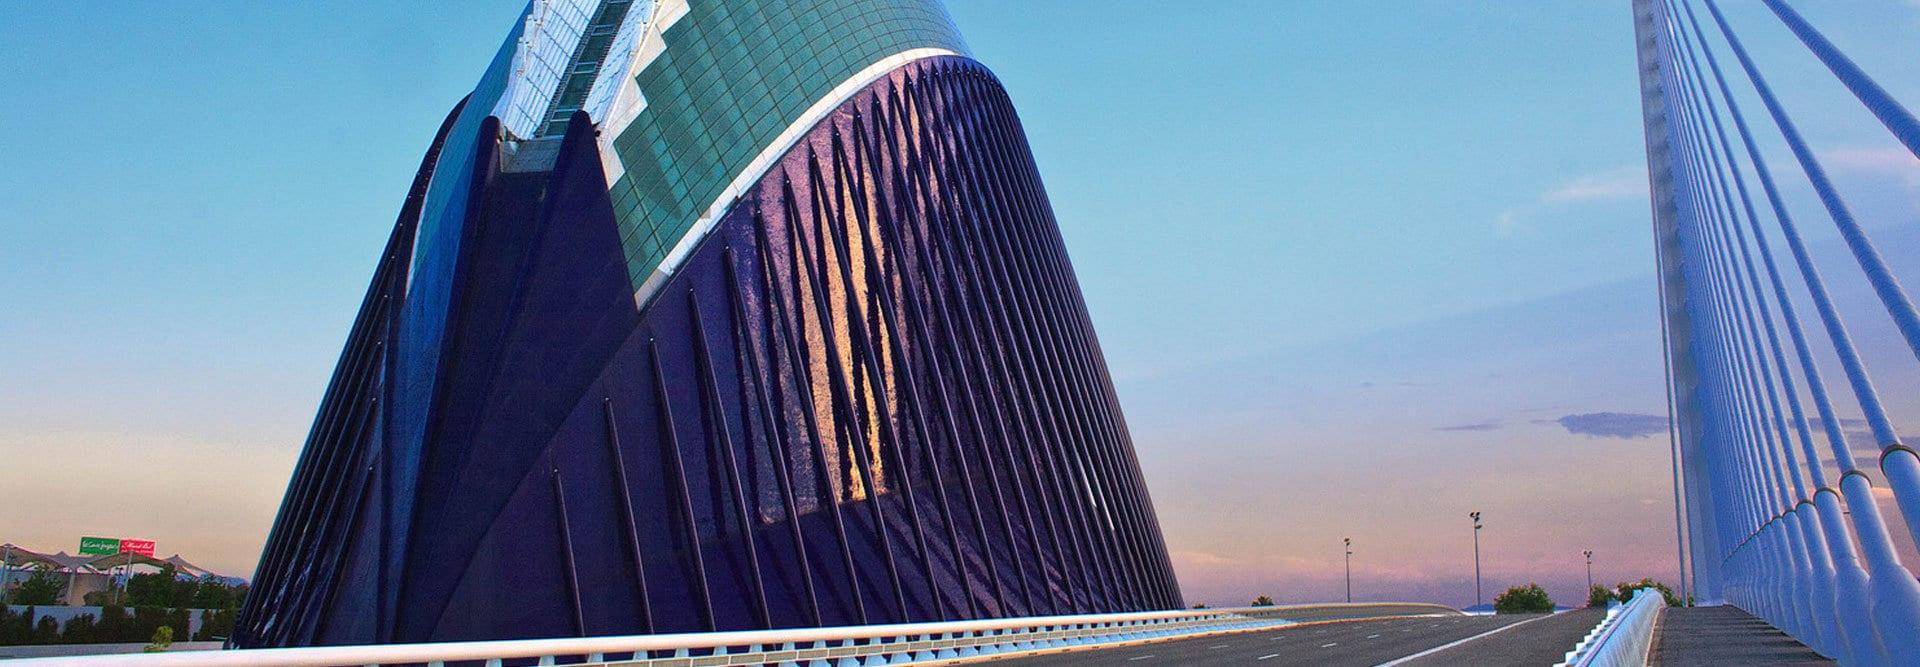 The-agora-Valencia-experiences-and-gateways